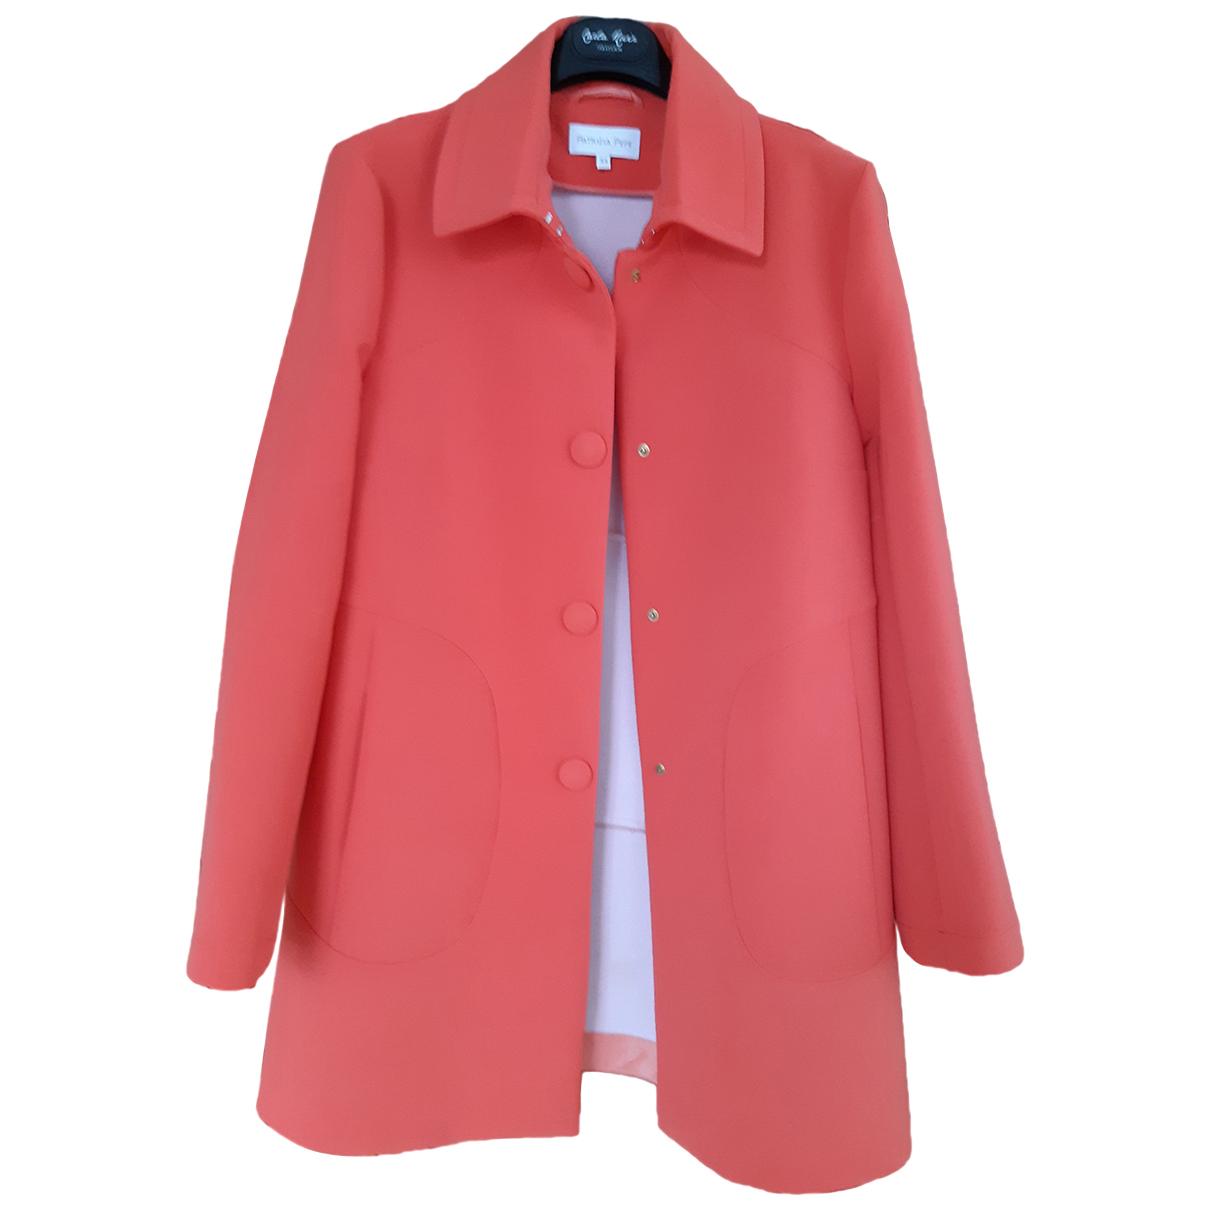 Patrizia Pepe N Orange jacket for Women 44 IT